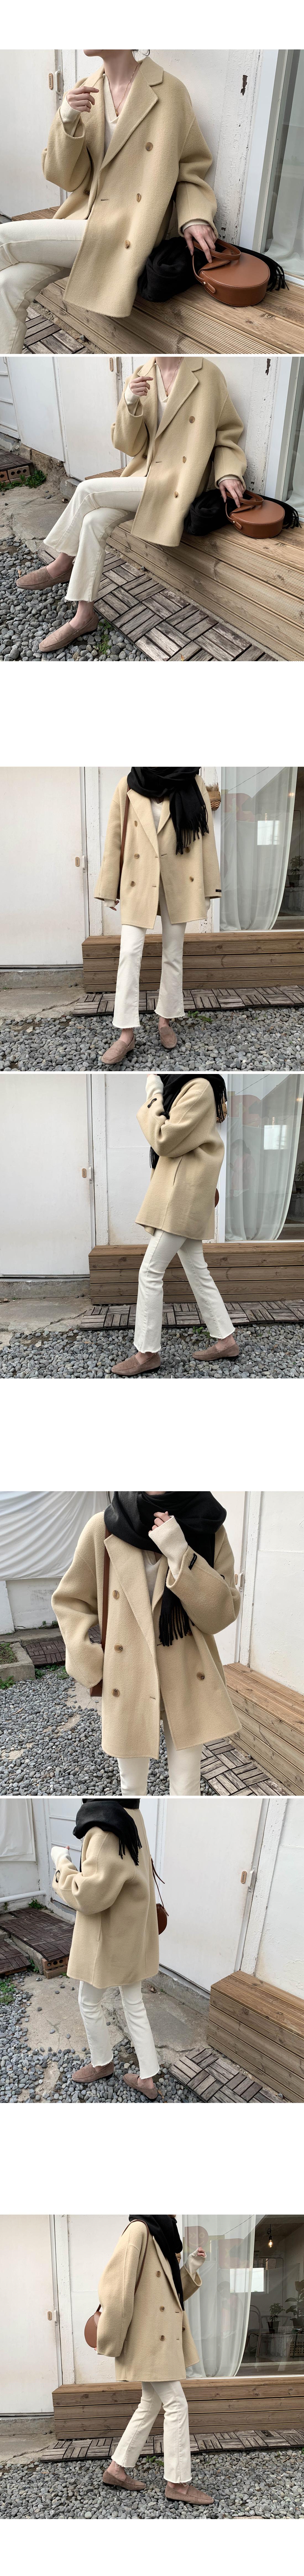 Jetty slim Flared cotton pants - black M, L